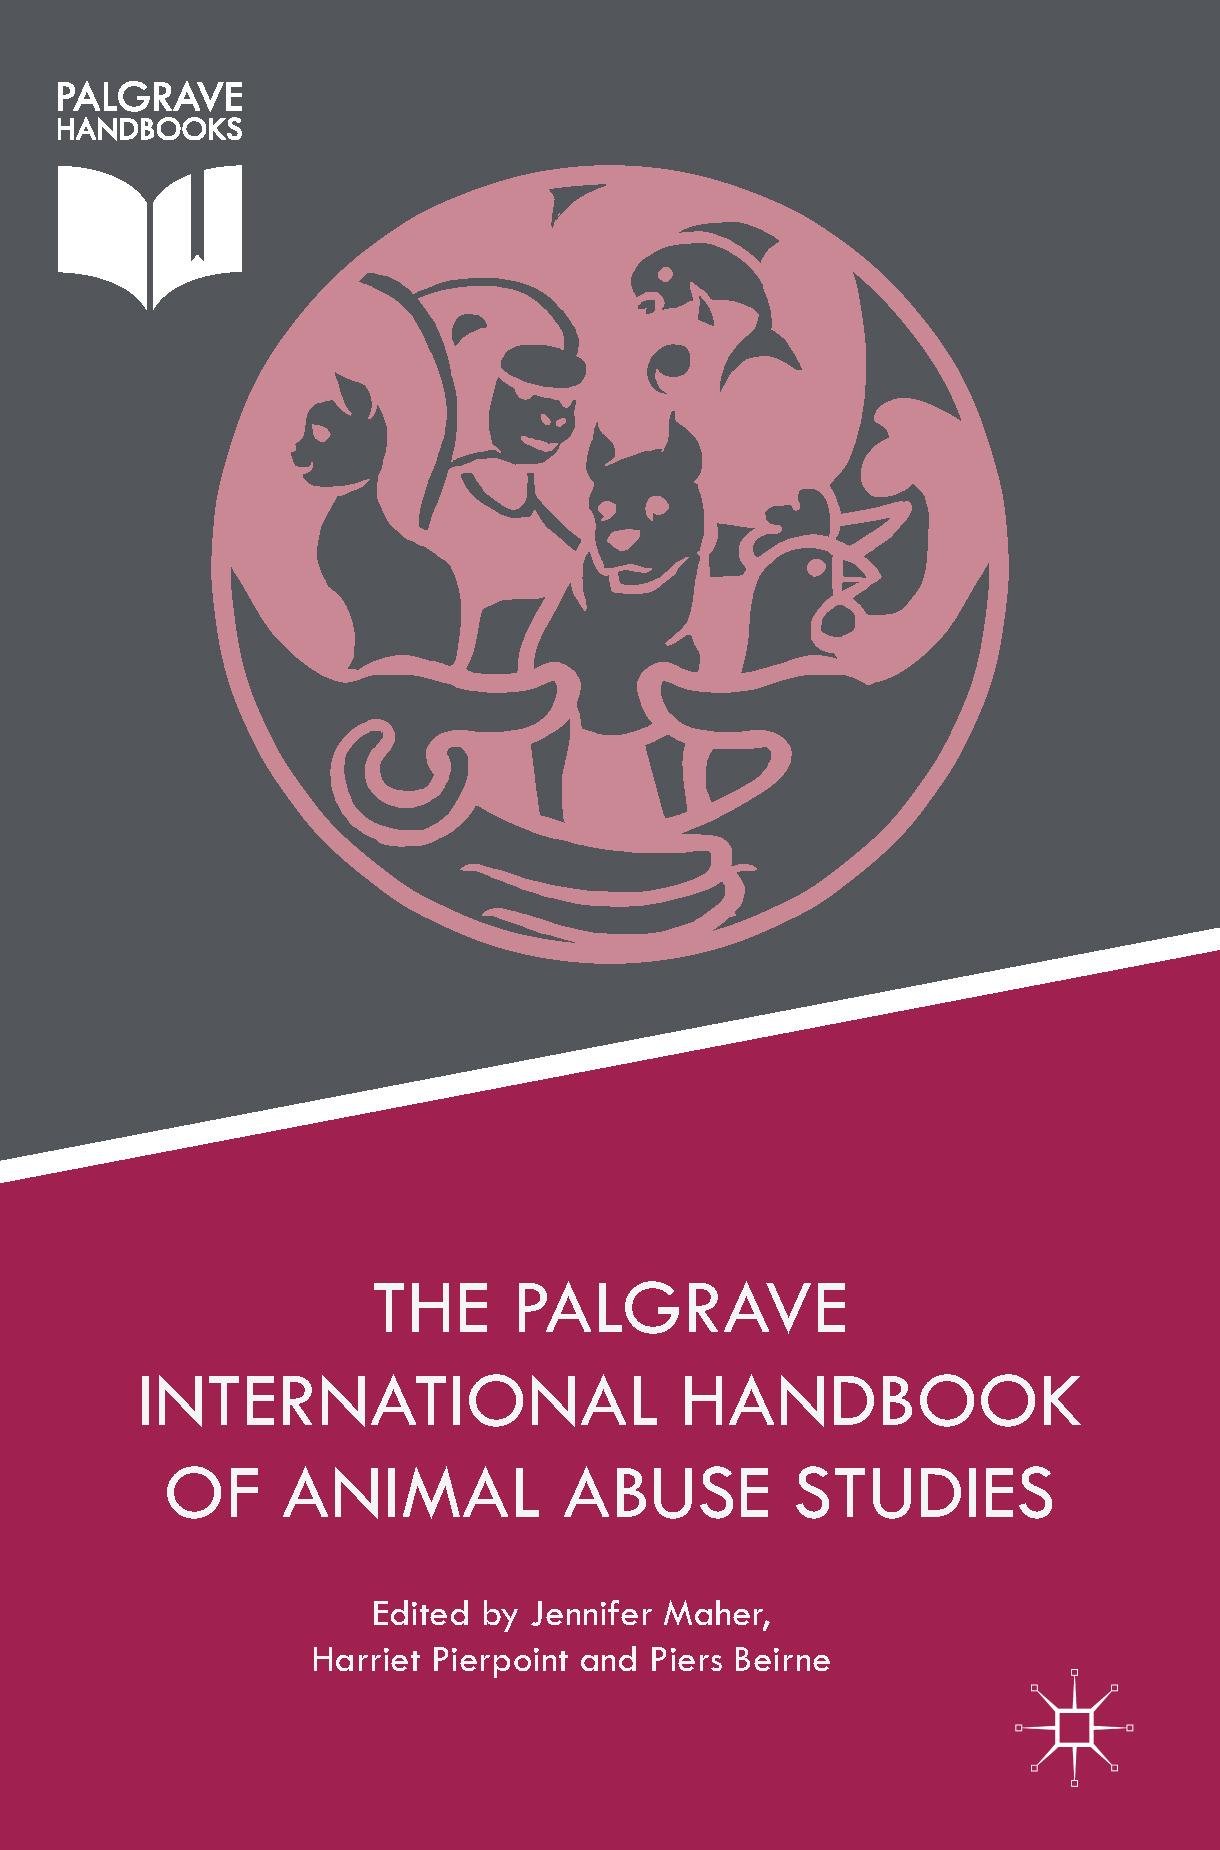 Beirne, Piers - The Palgrave International Handbook of Animal Abuse Studies, ebook